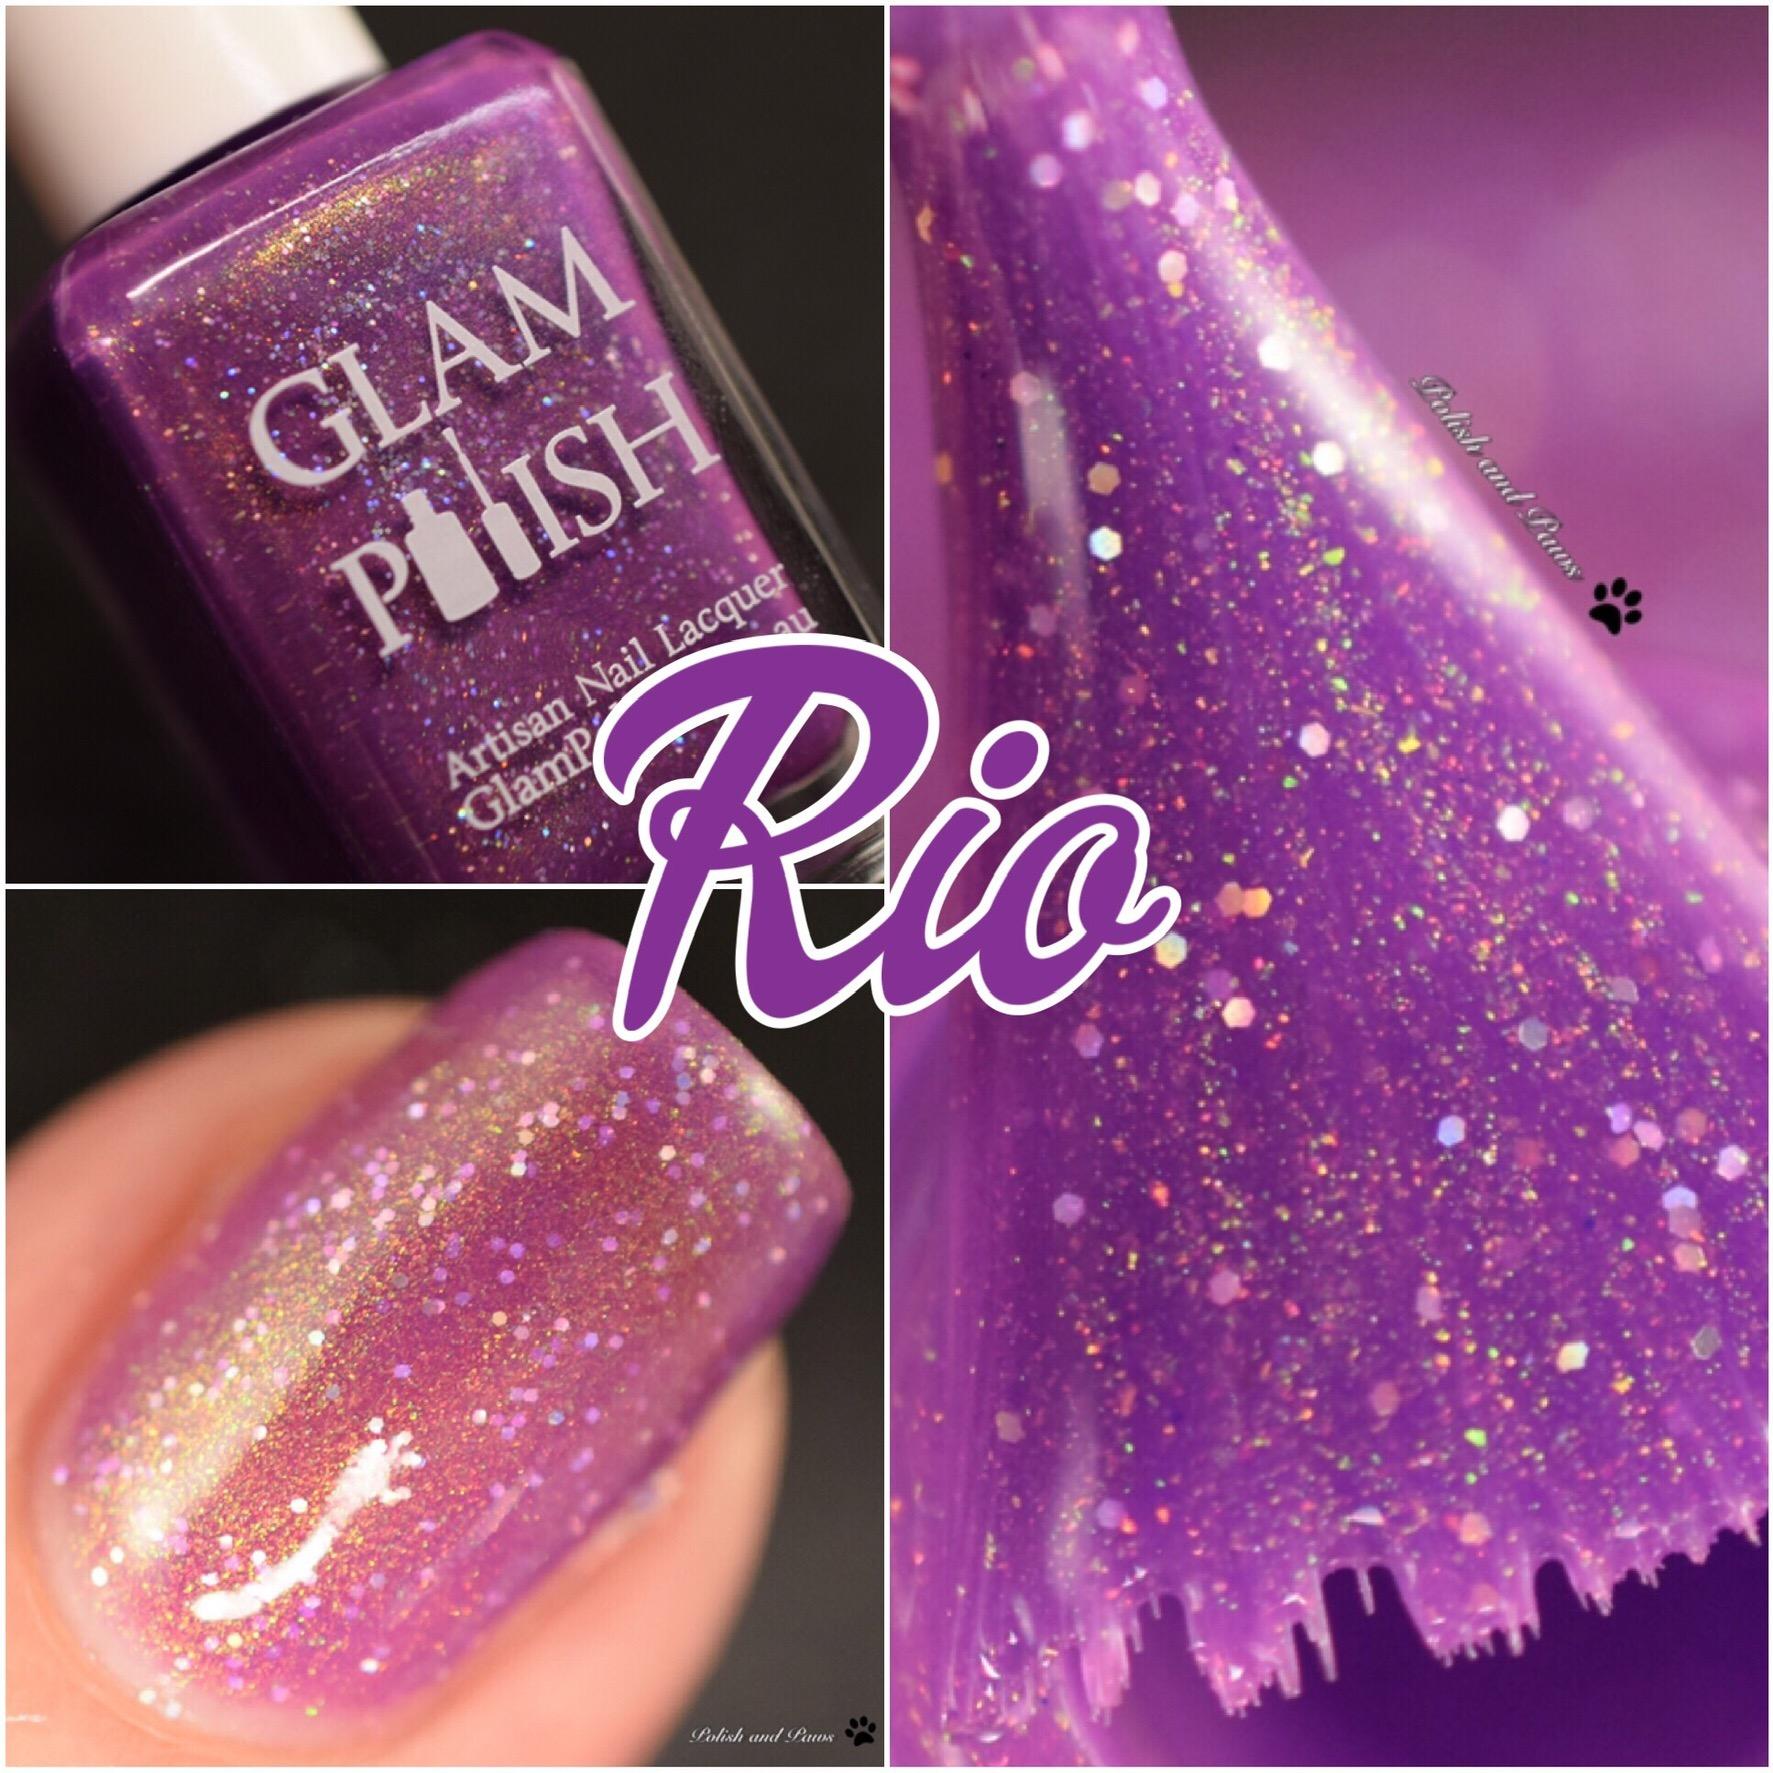 Glam Polish Rio